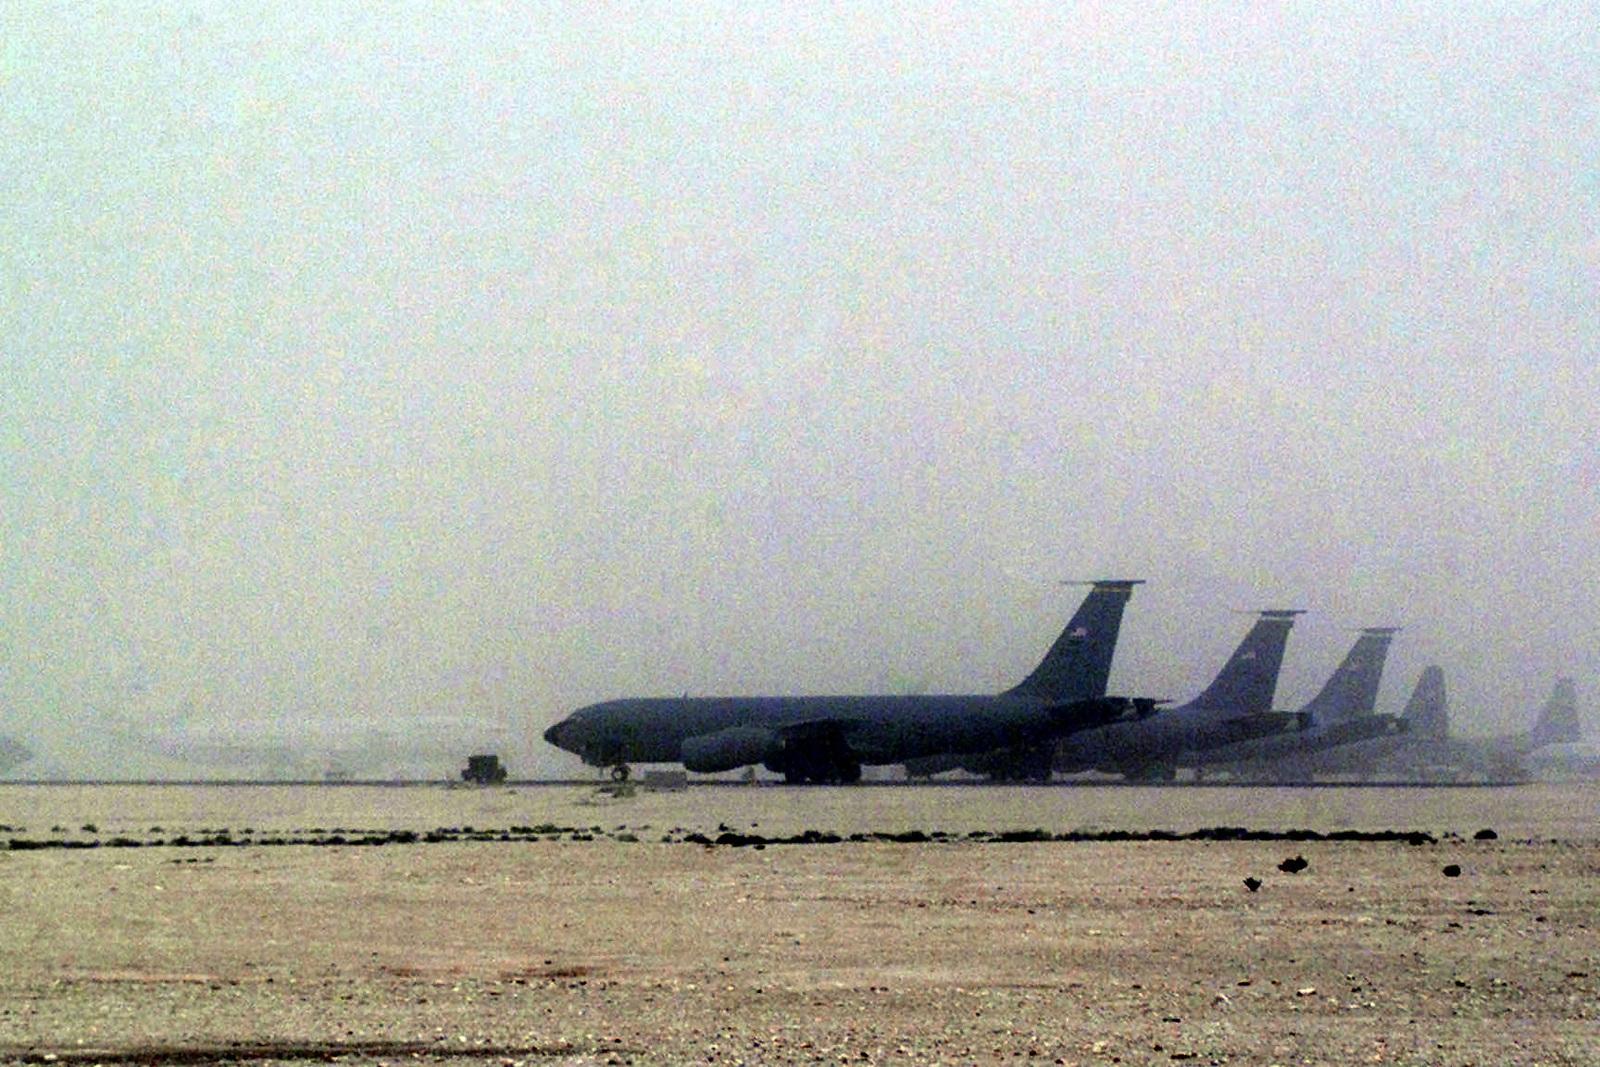 Consider, Air force refueling aircraft good luck!